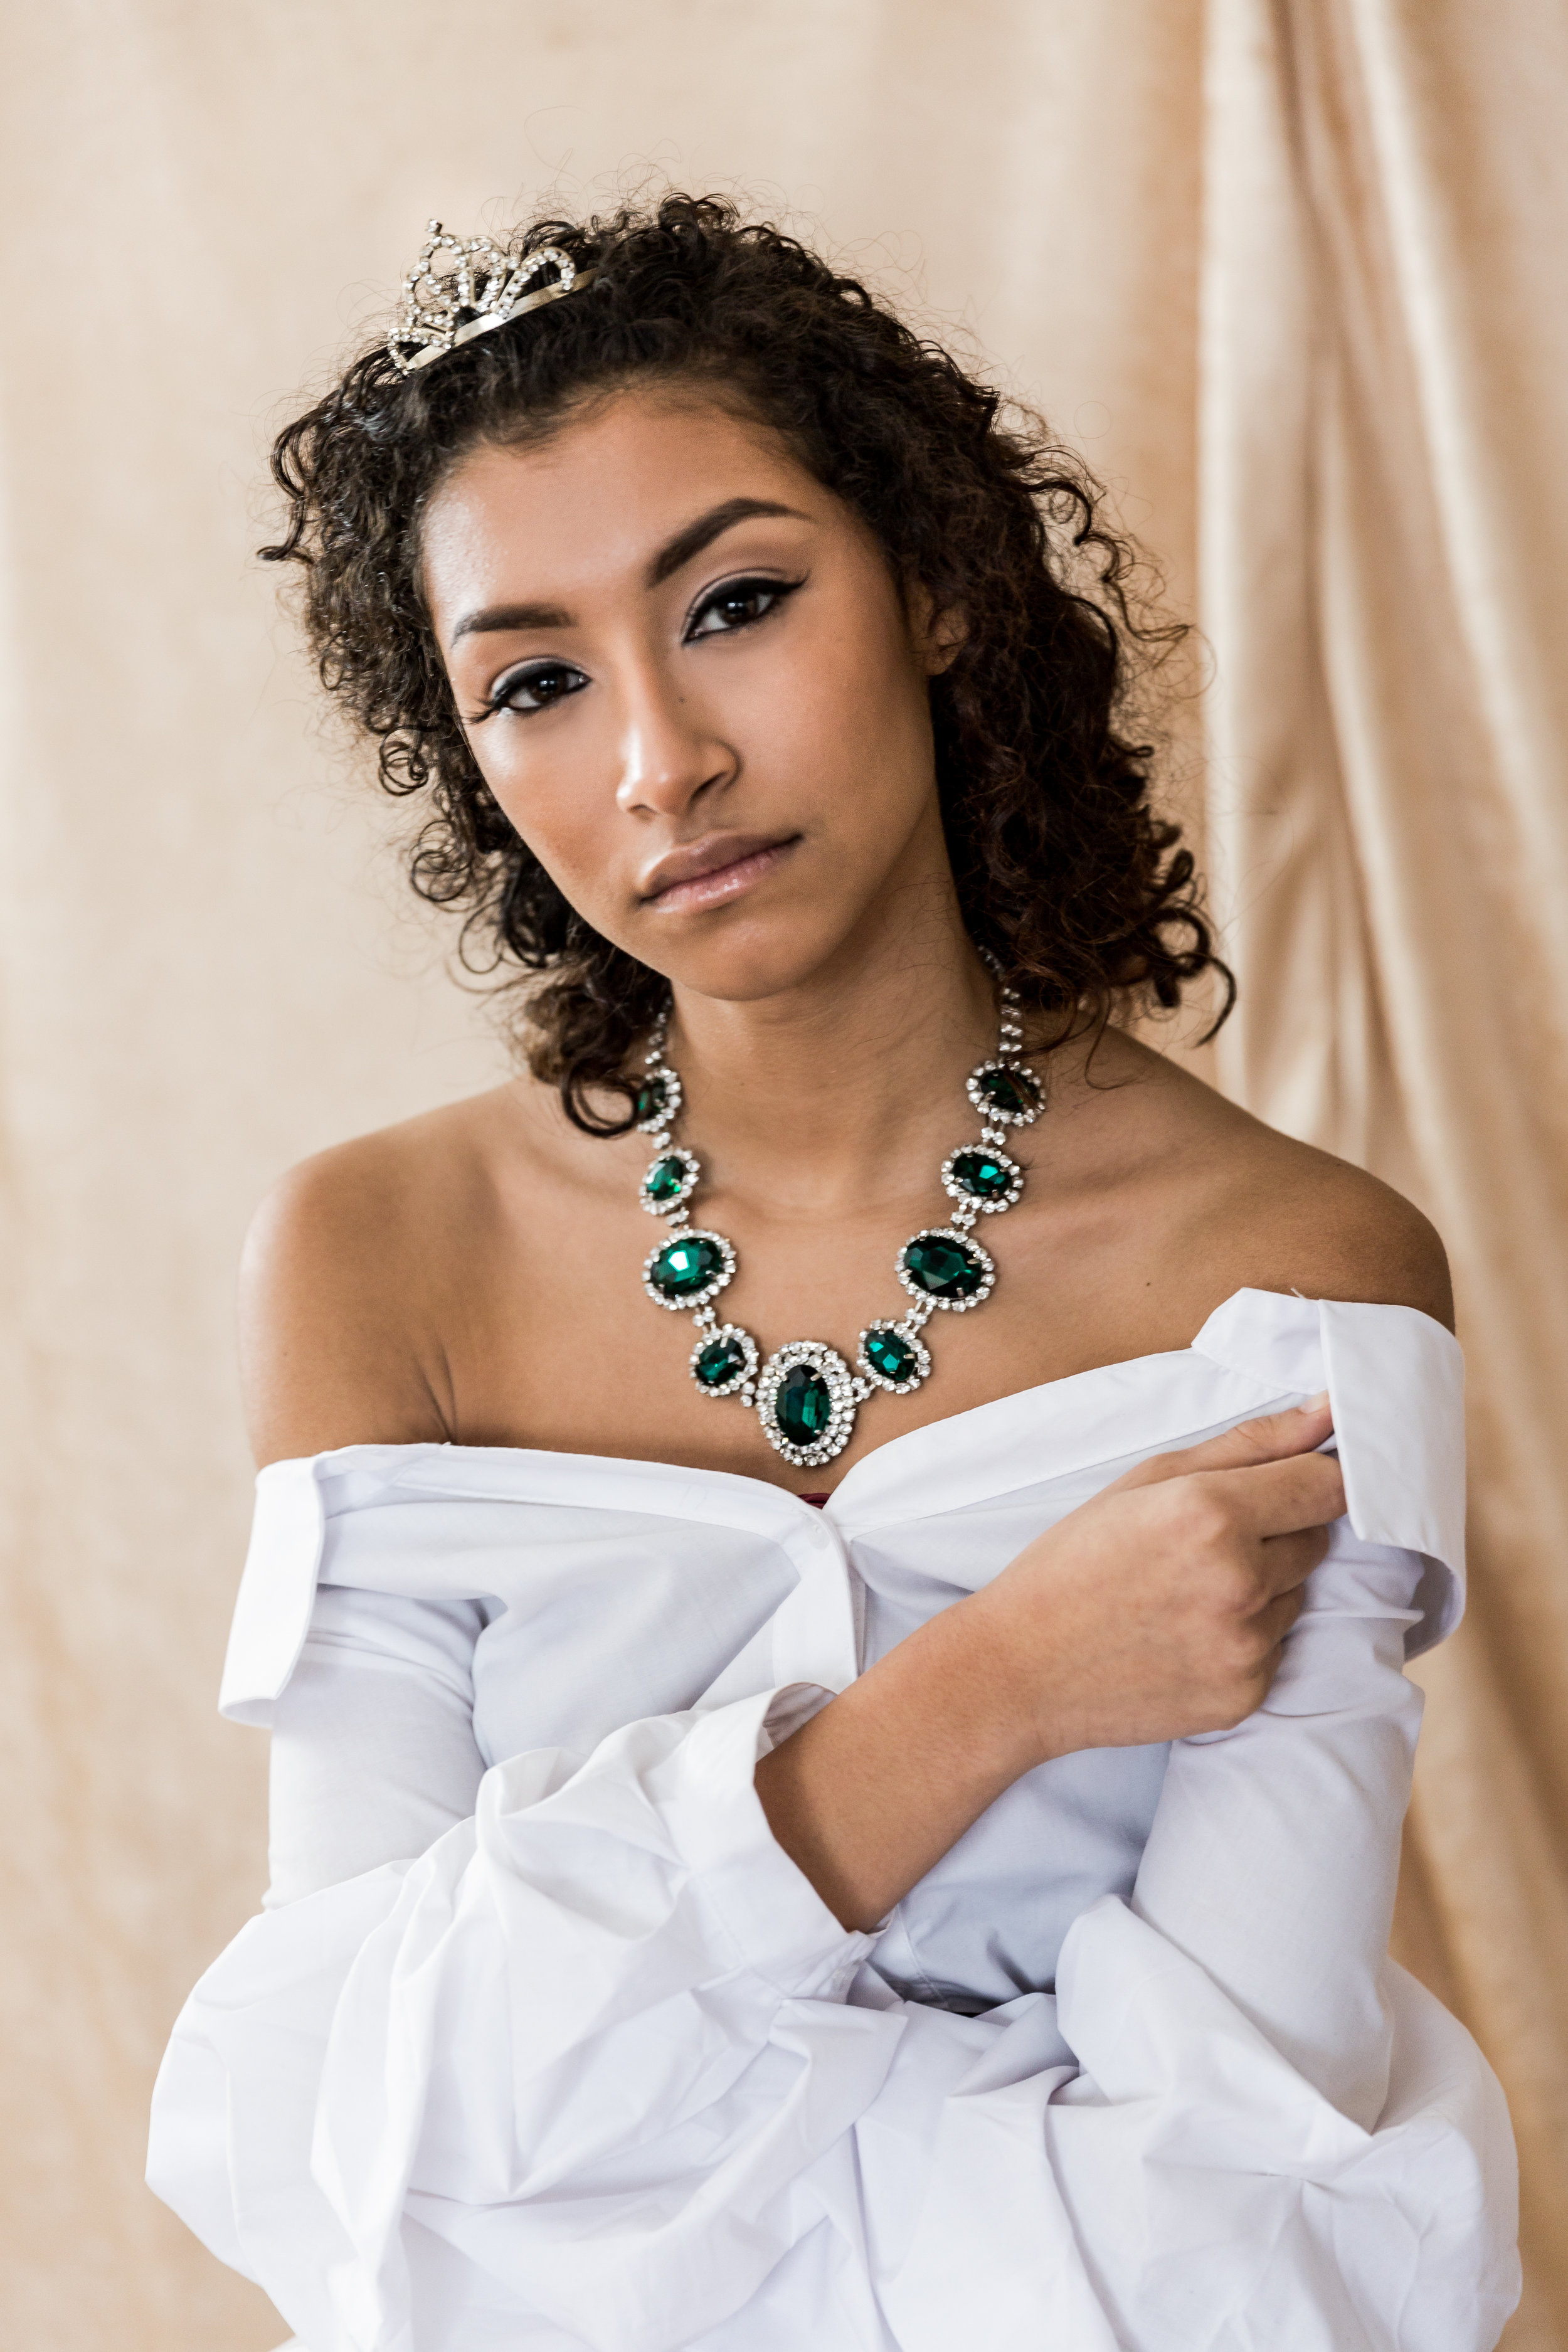 Tenneal McNair Photography Portraits Editorial Fashion Photographer Washington DC New Orleans NY (22).jpg